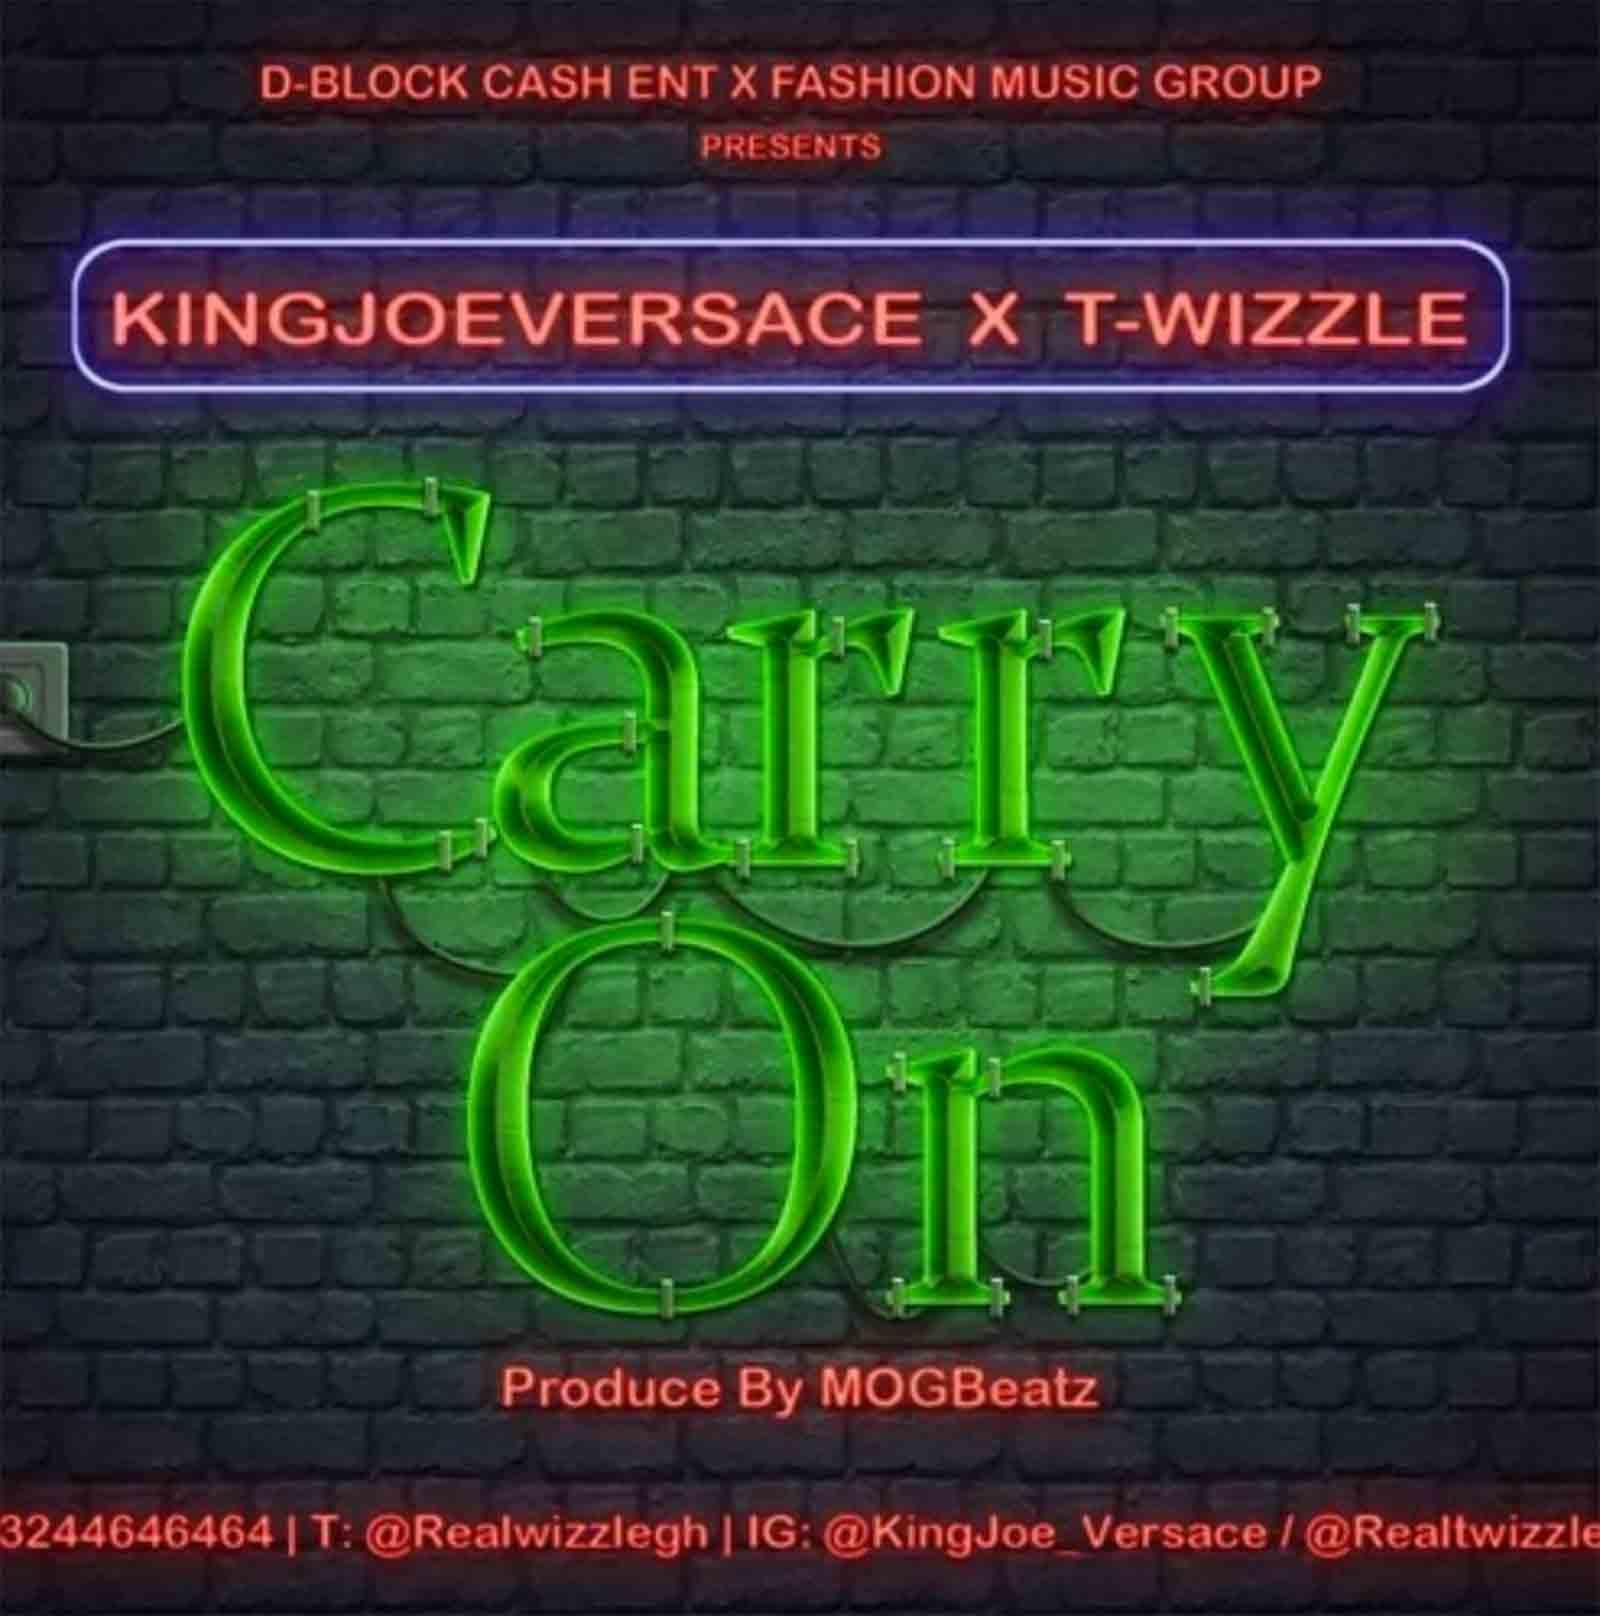 Carry On by King Joe Versace feat. T-Wizzle